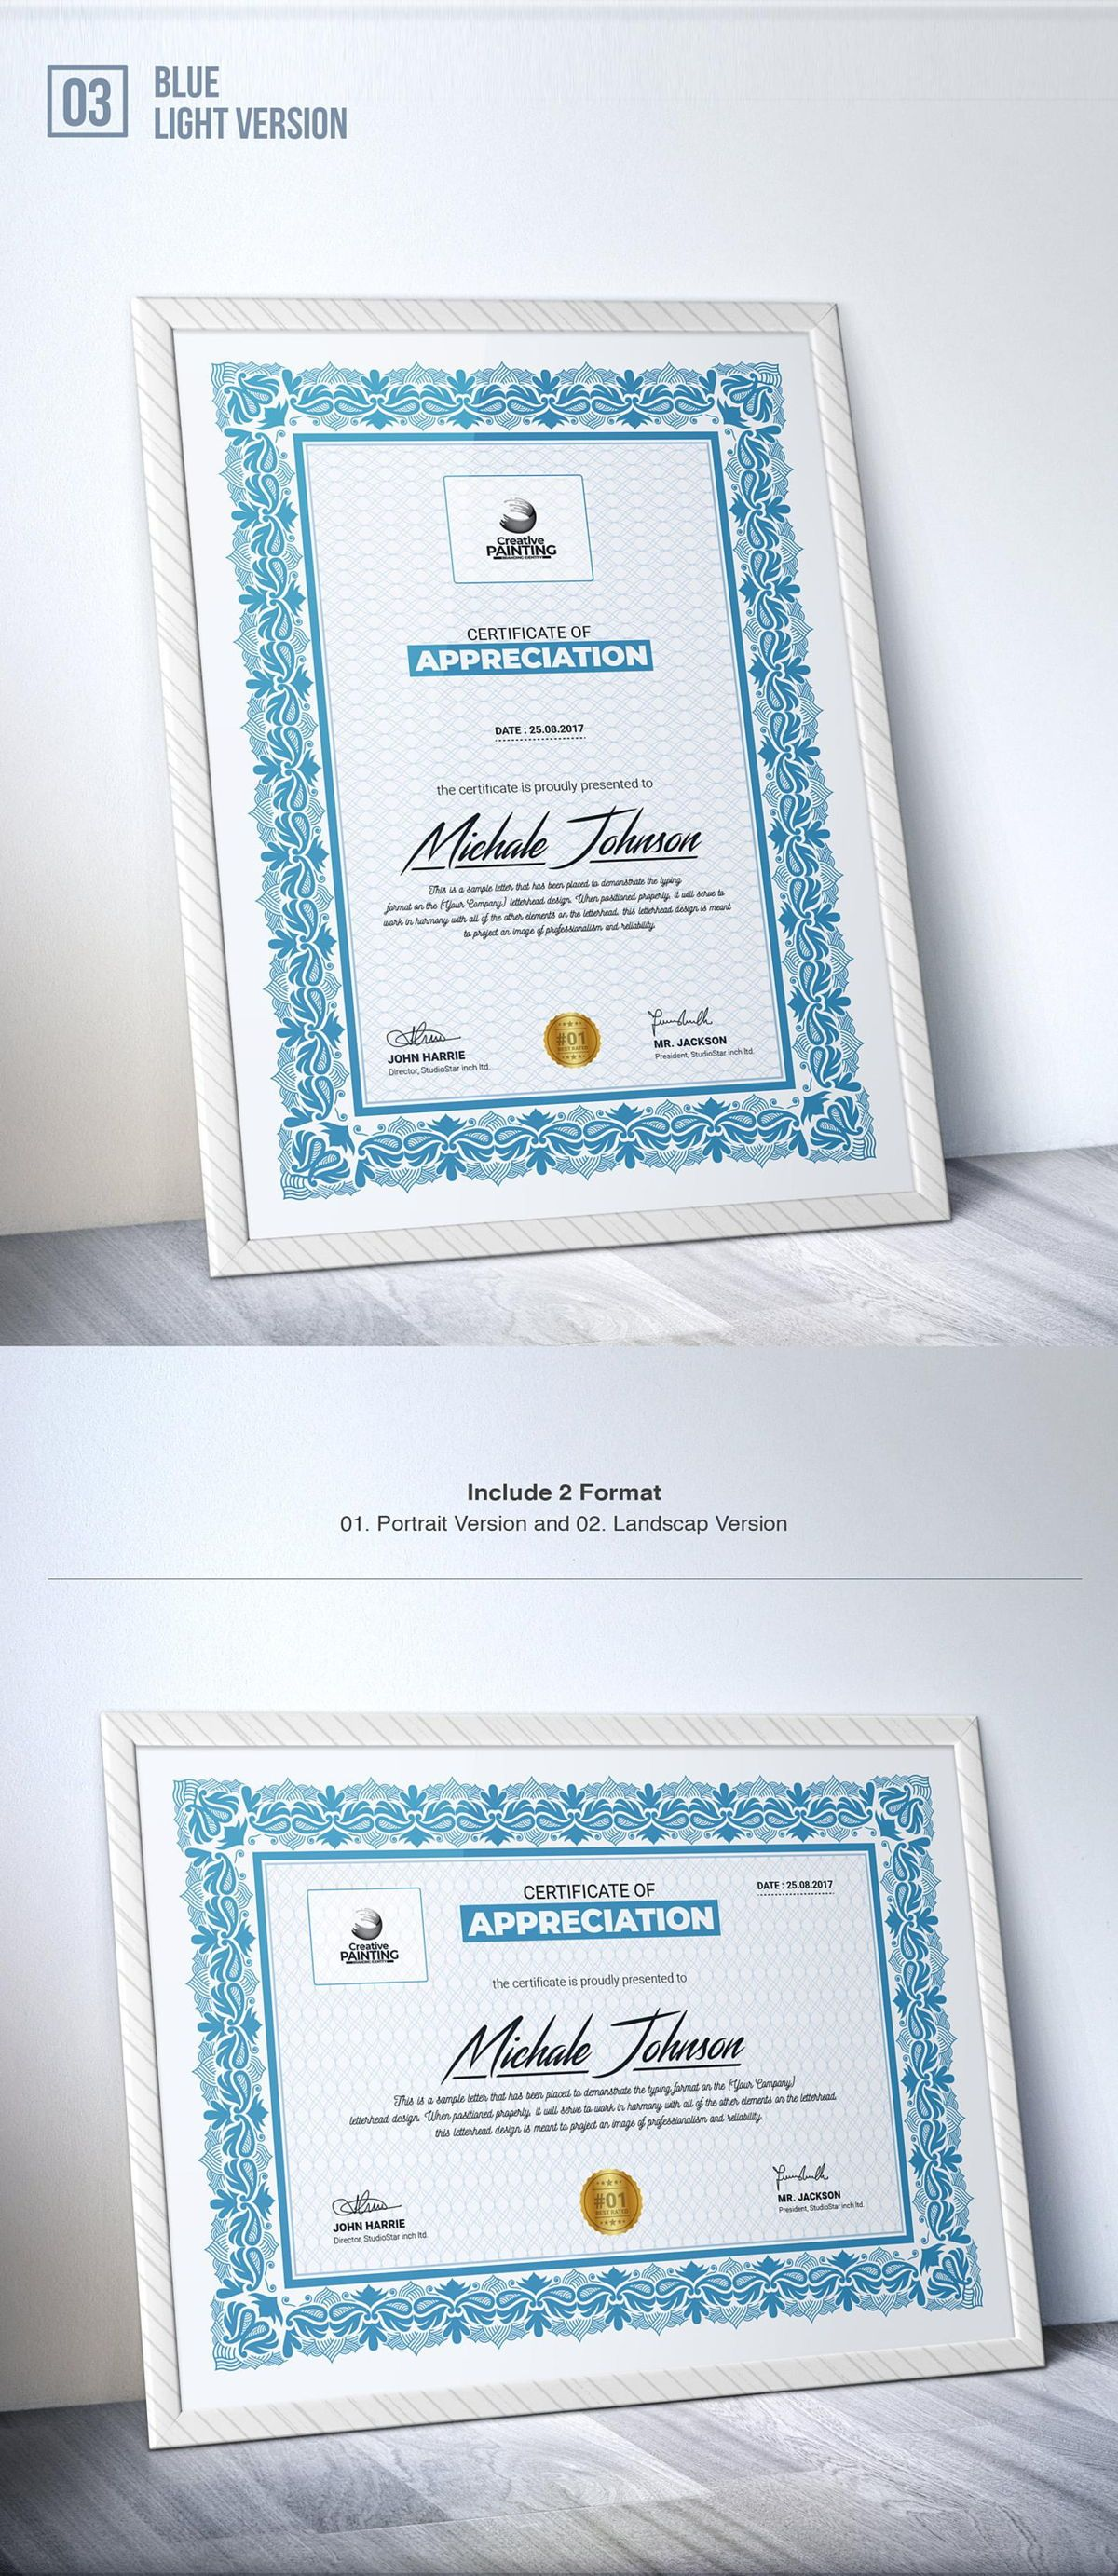 Creative Painting Certificate - 8 Colors - Dark and Light Version, Slide 5, 08755, Business — PoweredTemplate.com